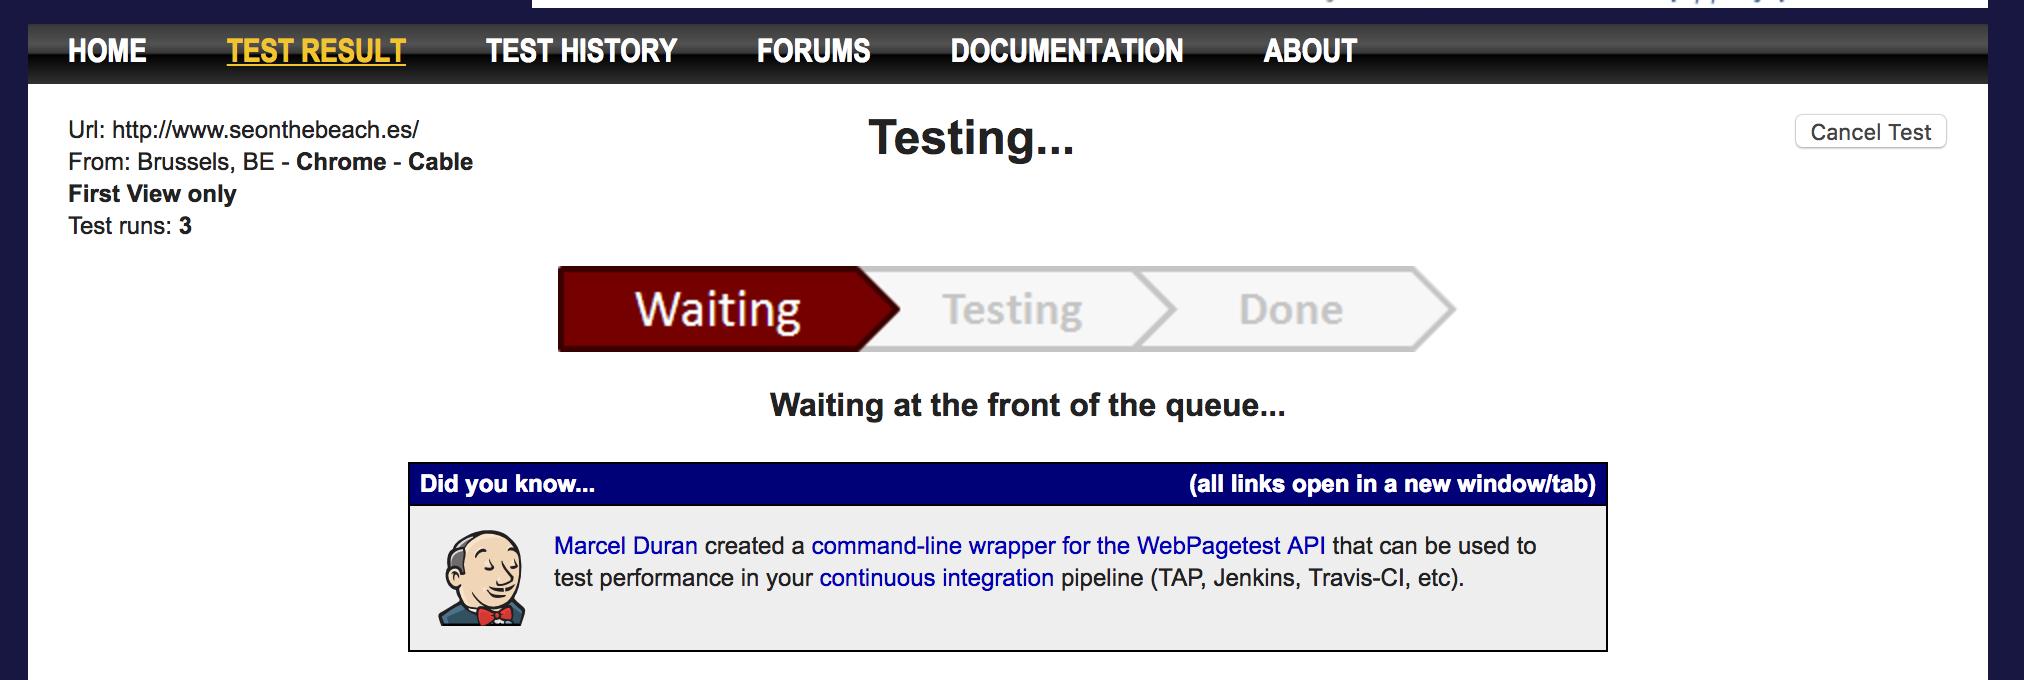 webpagetest-fases